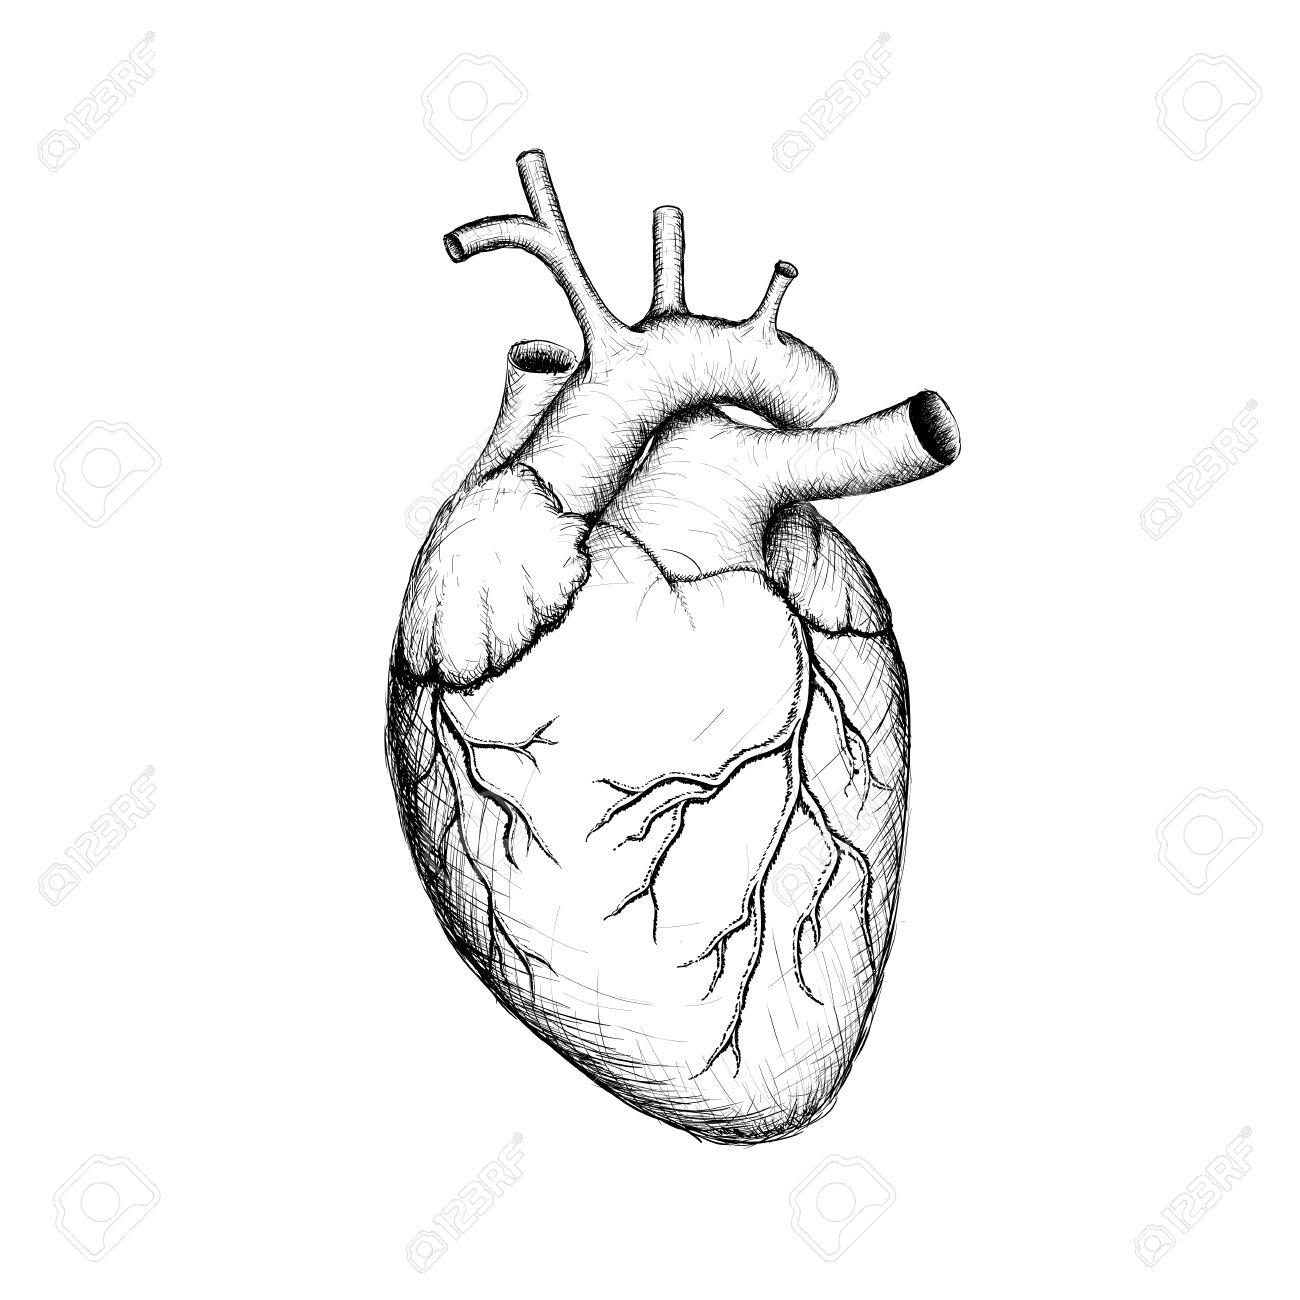 Human Heart. Internal Organs. Anatomy. Stock Vector Image. Royalty ...